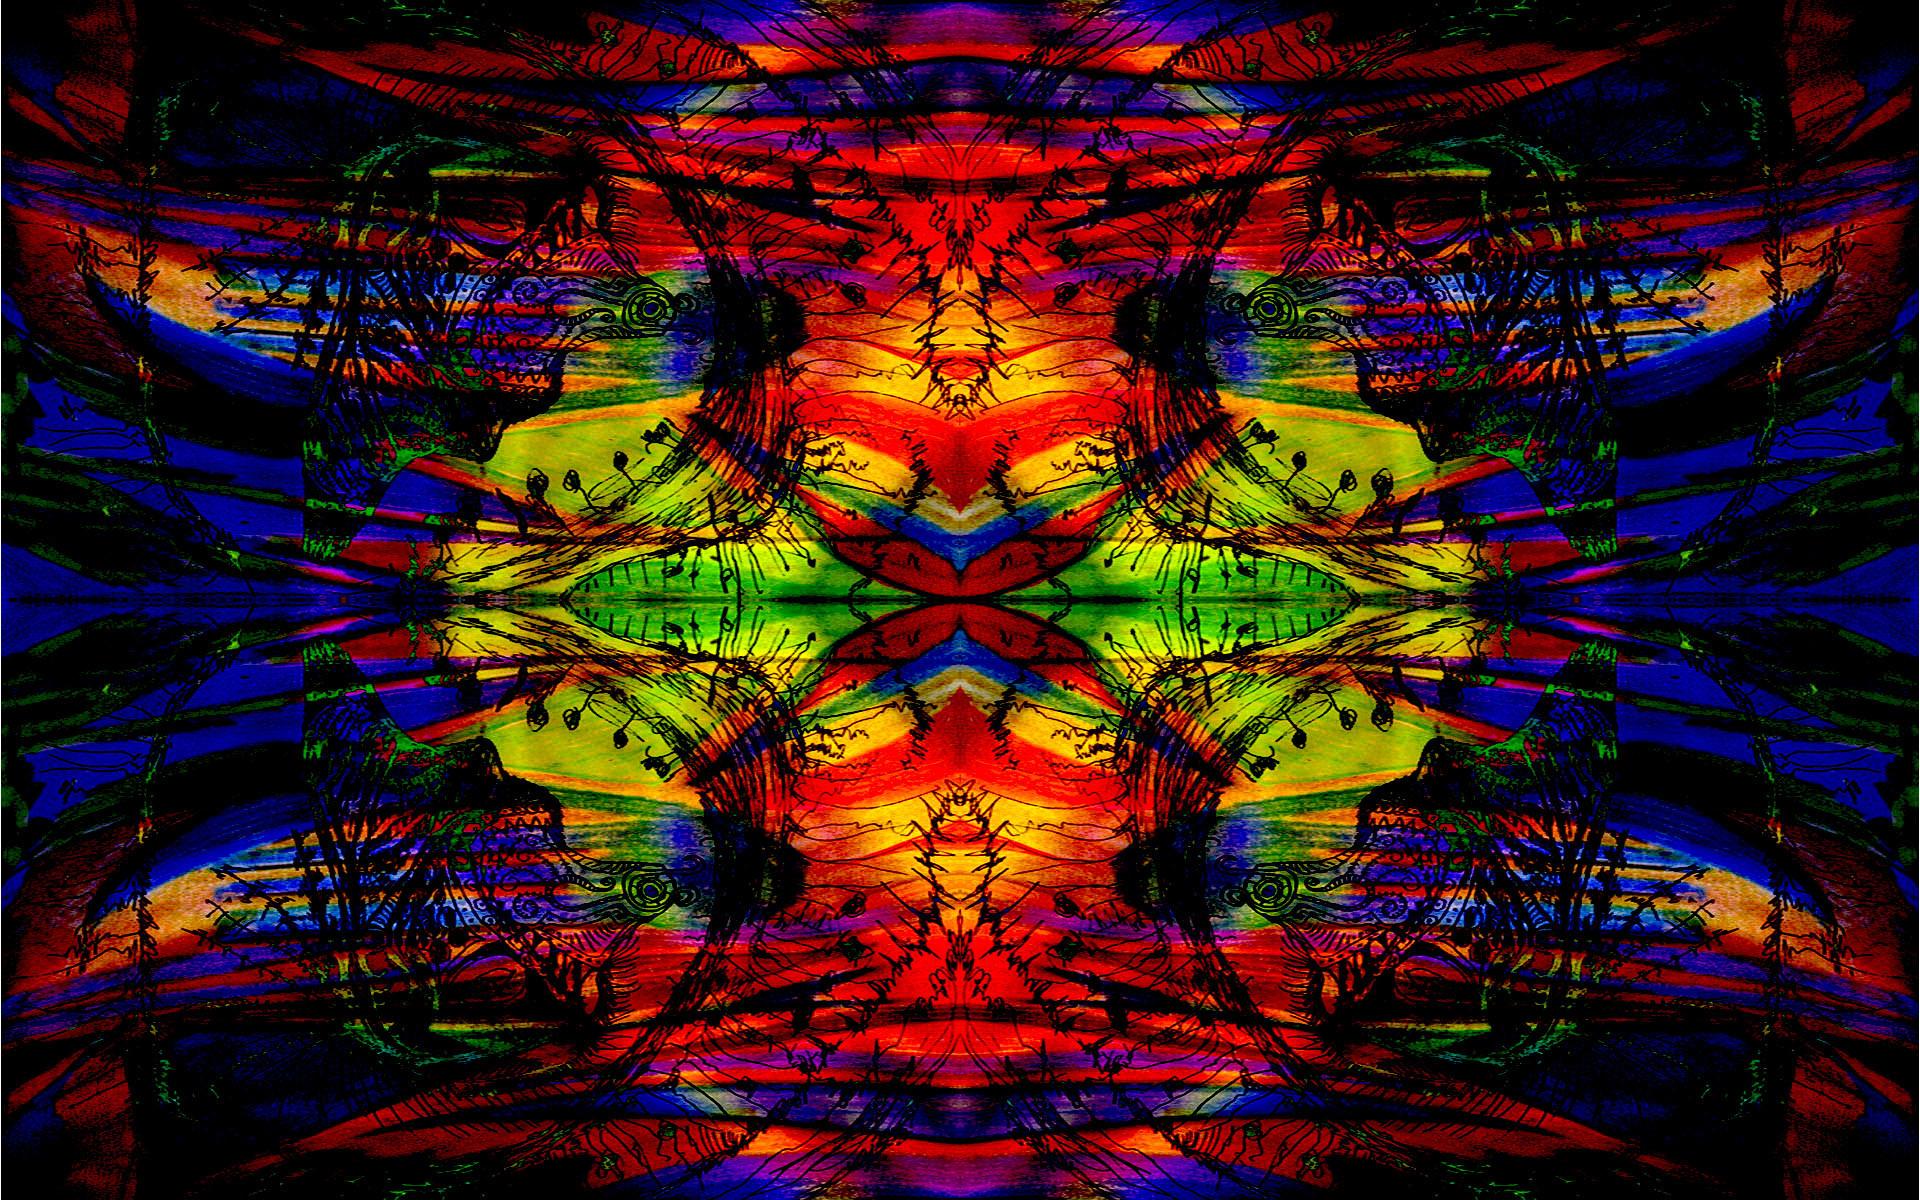 Acid Trip Wallpaper Hd 1080wallpaperhd Com Source Wallpapers